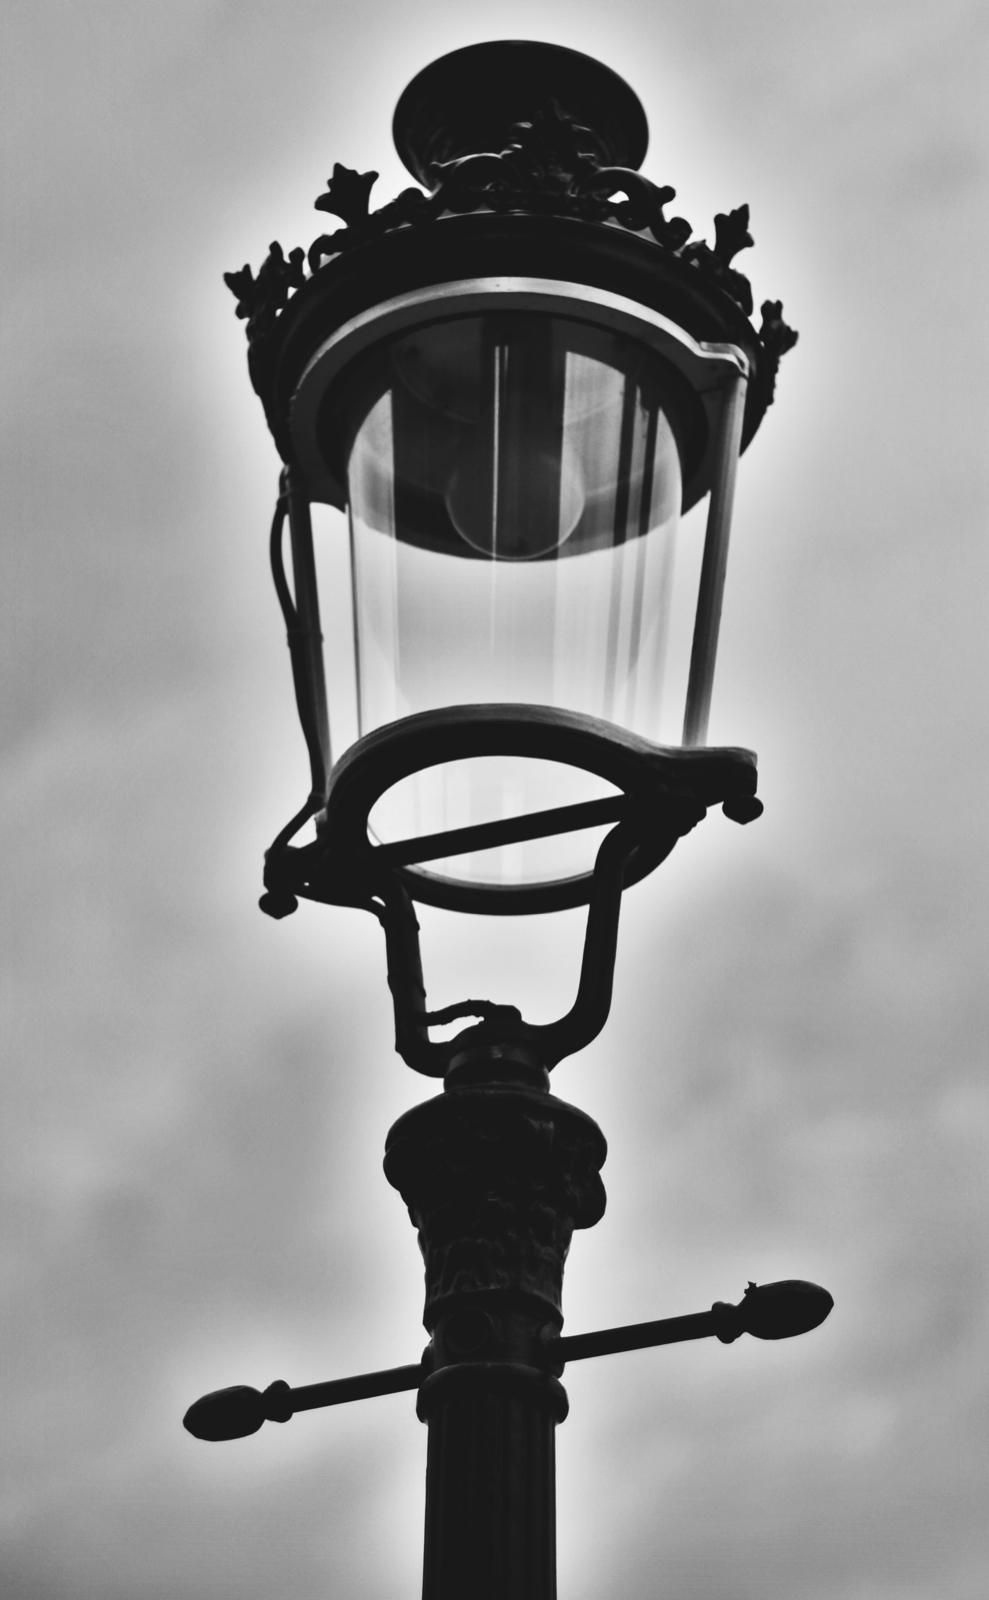 Black and white lamp.jpeg